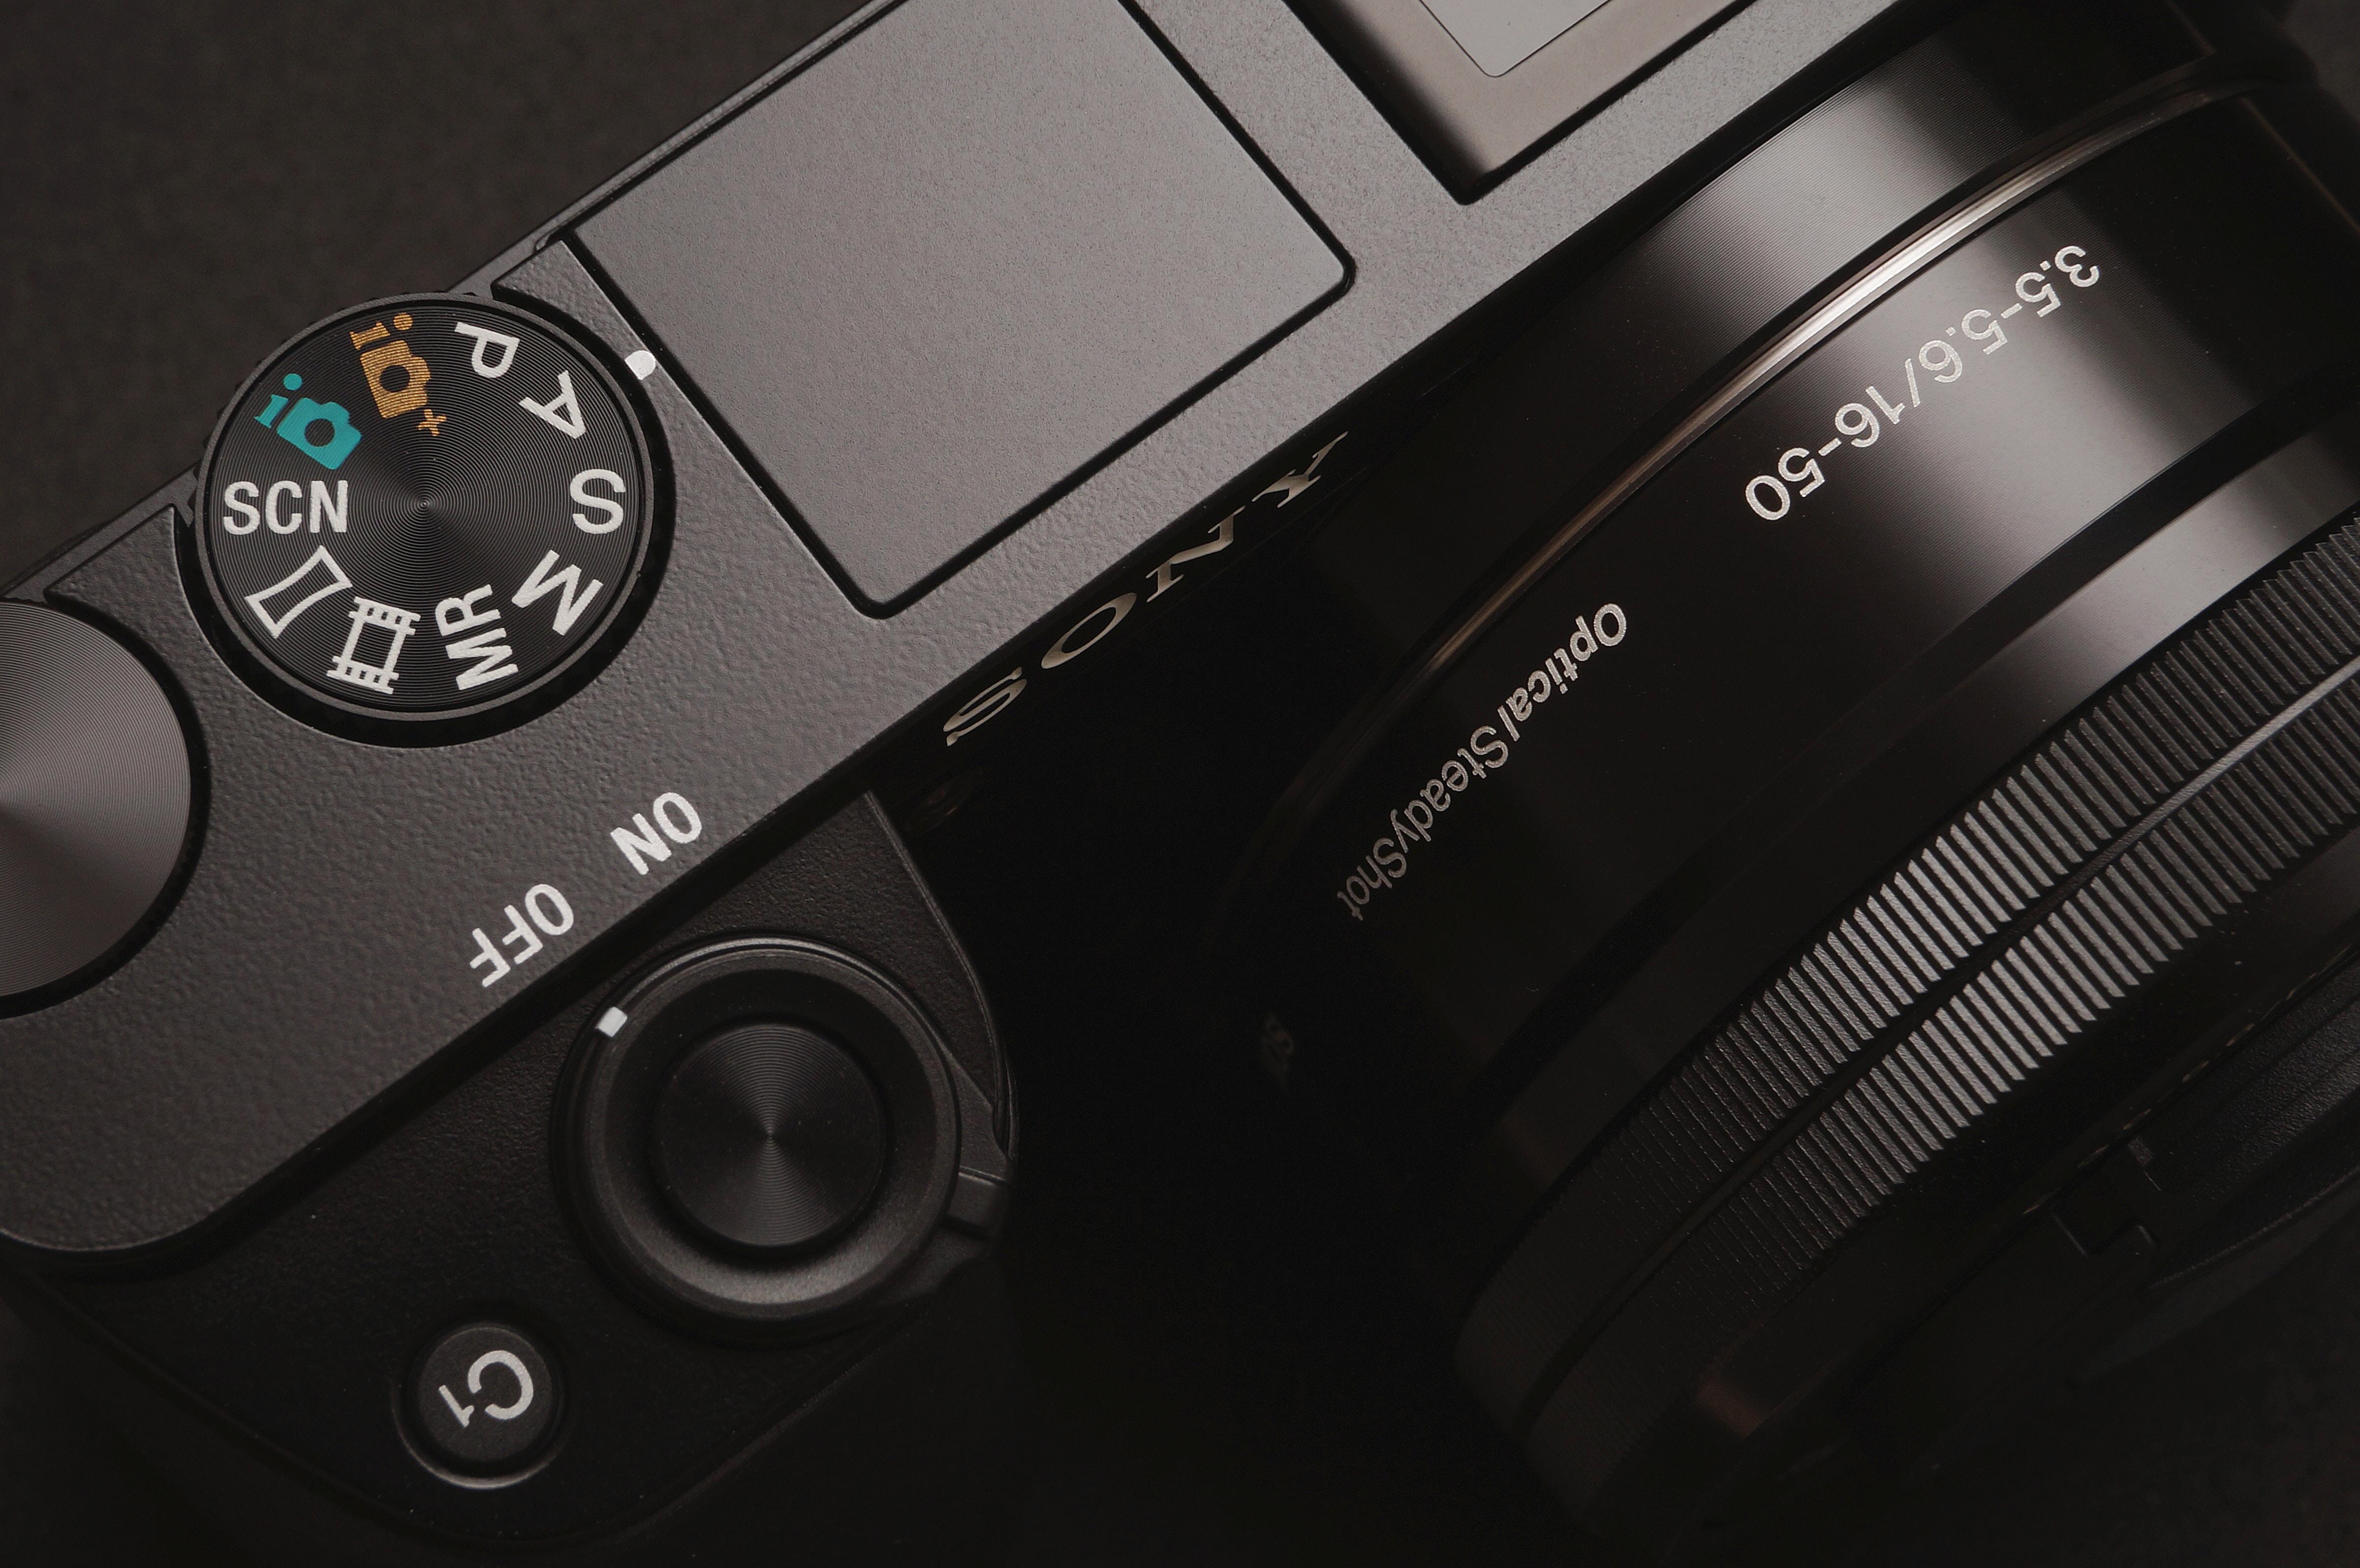 close-up photography of black Sony camera